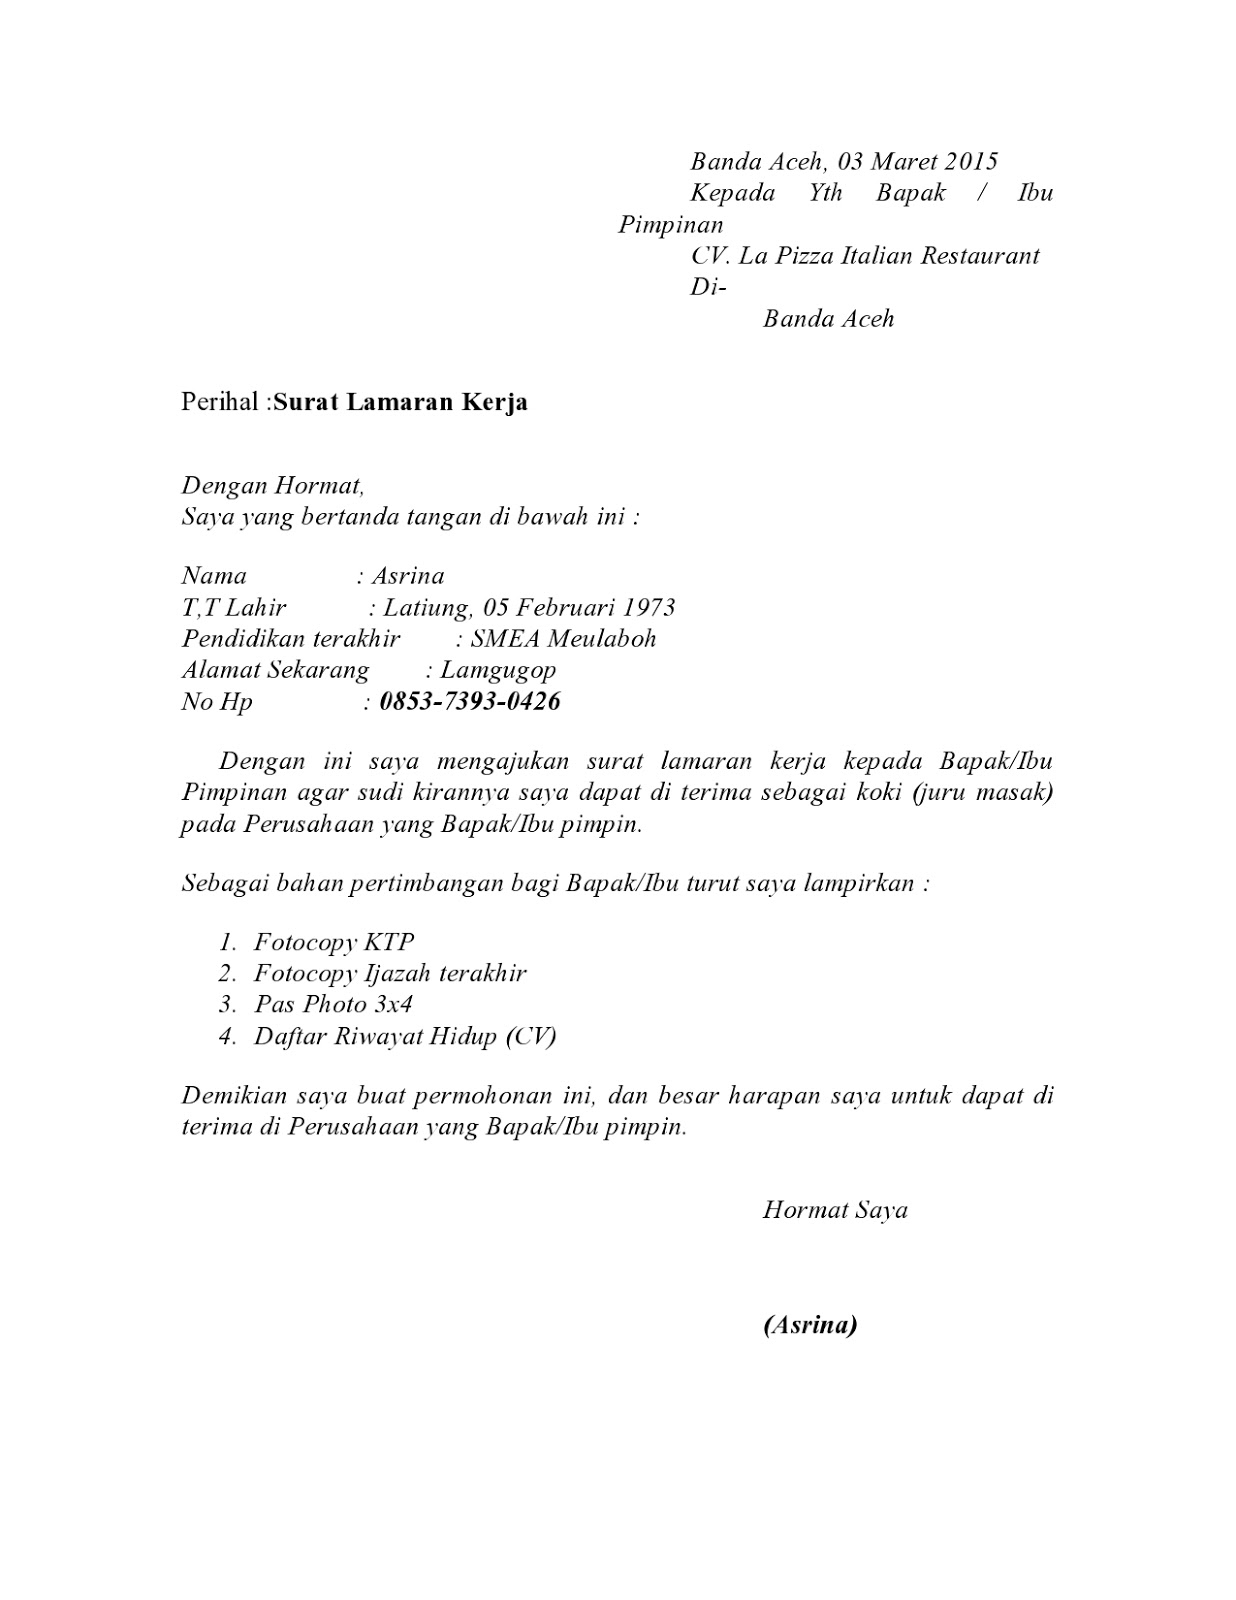 Contoh Surat Lamaran Kerja Bahasa Inggris Yang Simple Dan Artinya